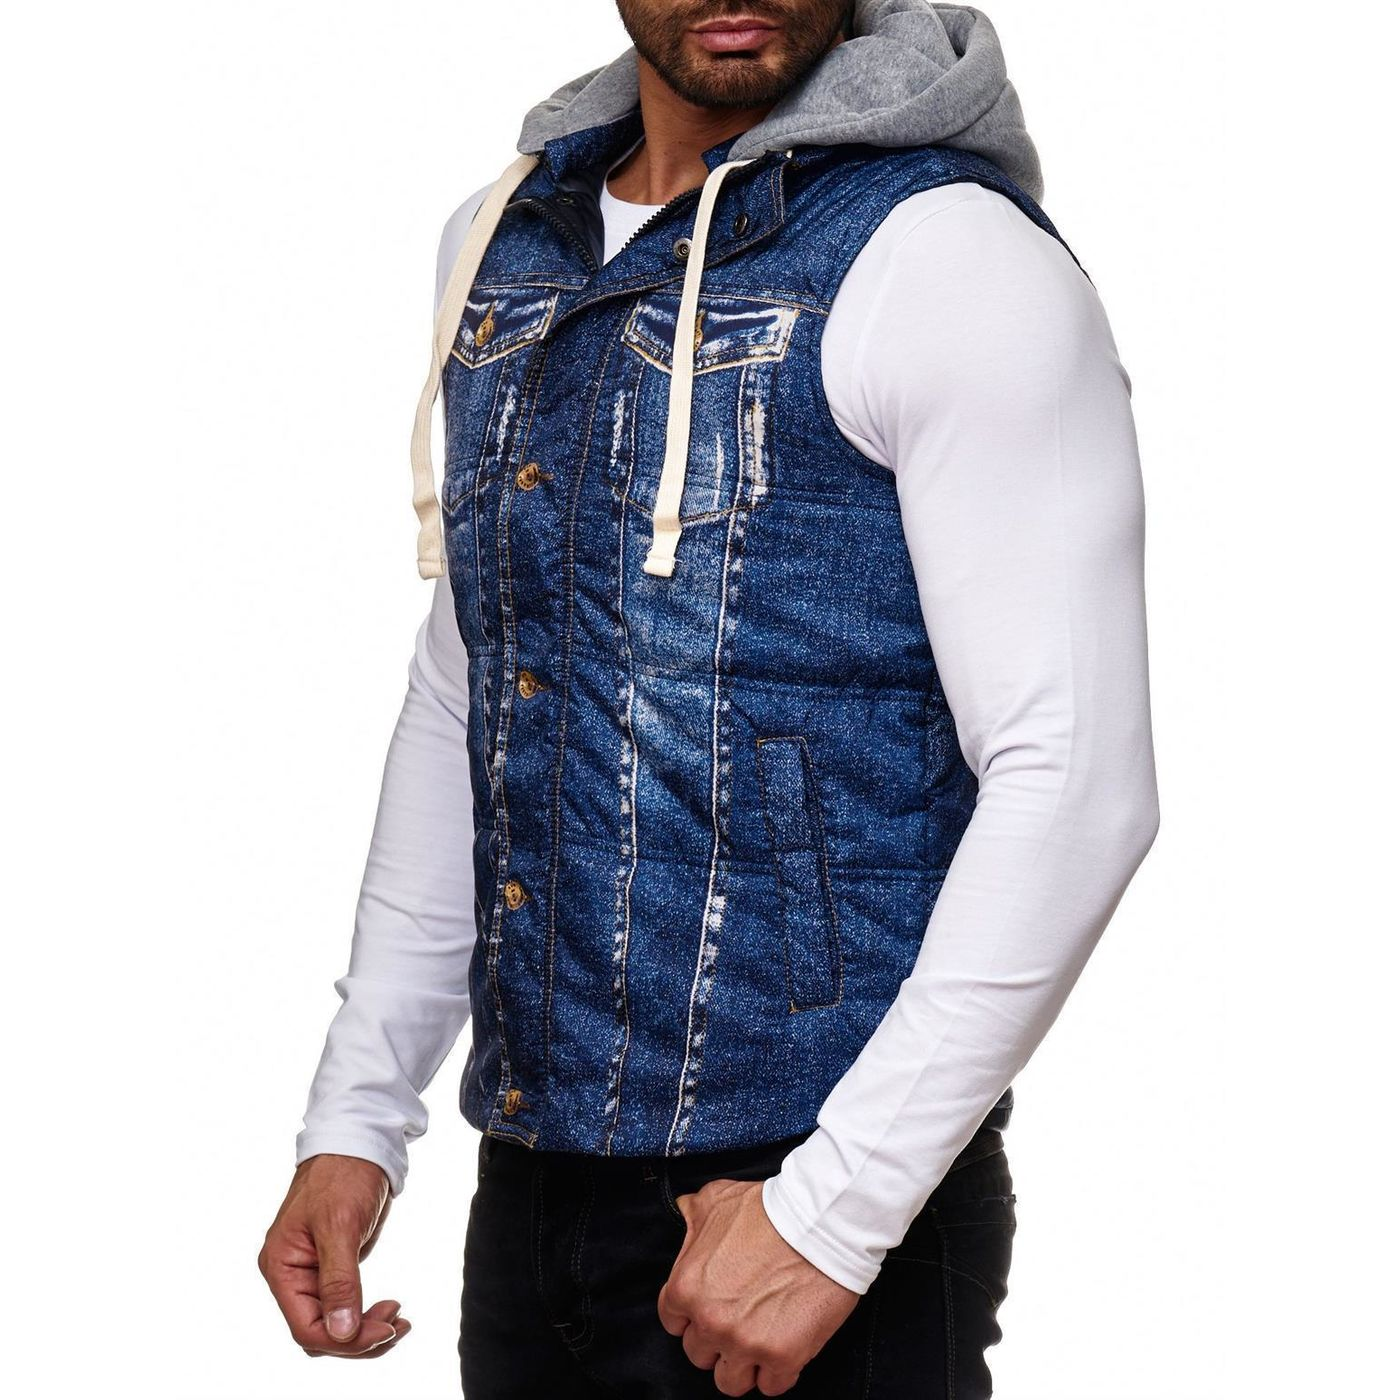 916b75a26167f0 Red Bridge Herren Denim Jeans-Look Printmotiv Weste Jacke Blau ...